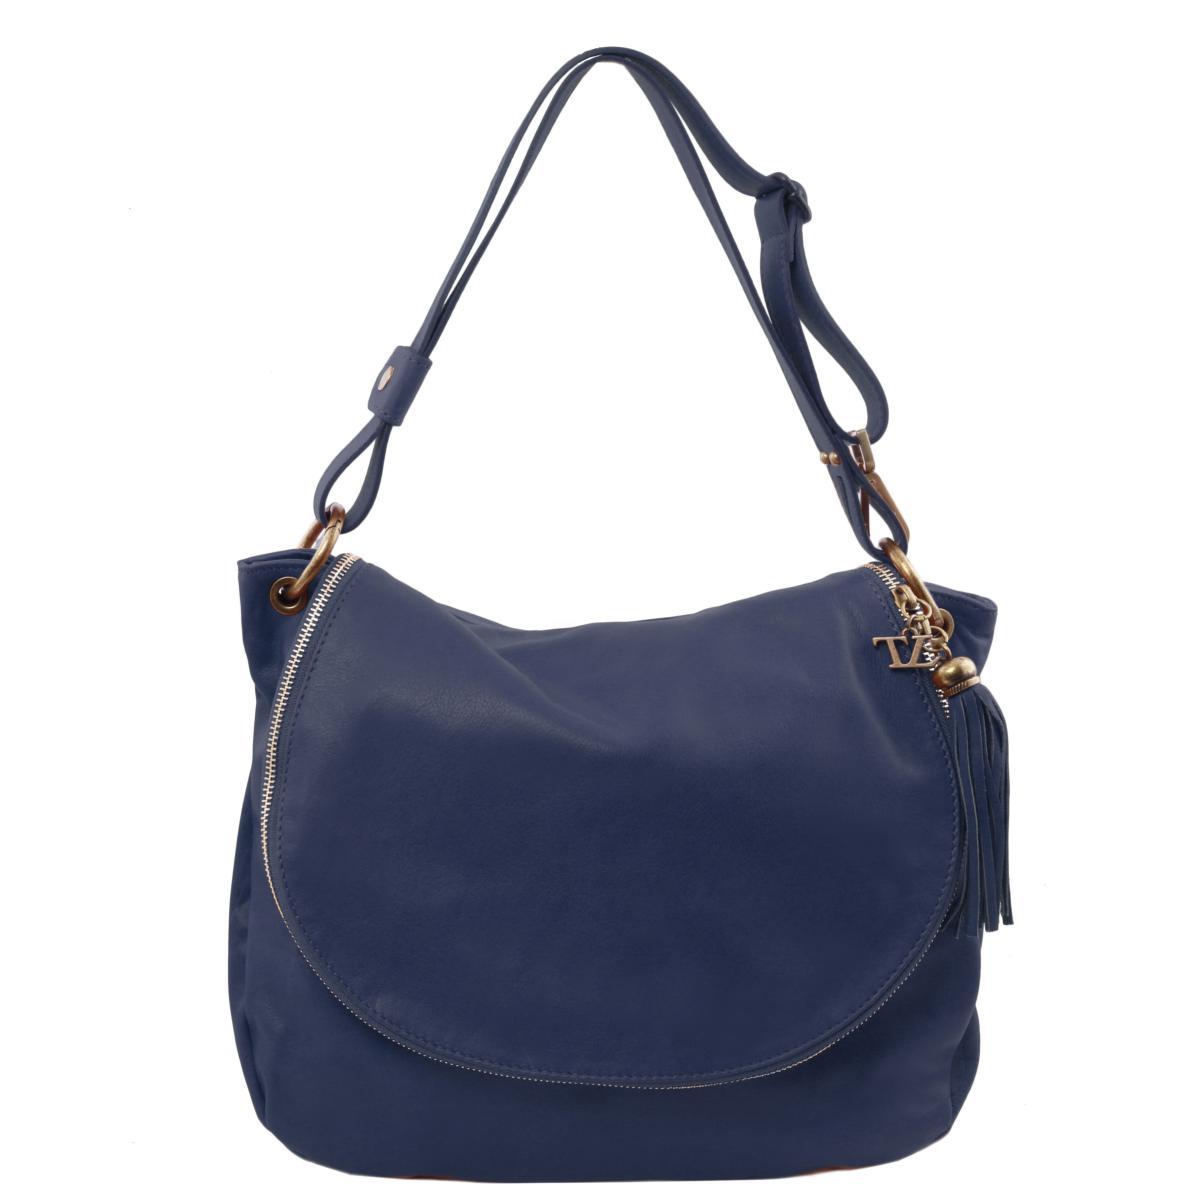 95cdc6a5a2ab Sac Cuir Bandoulière Besace Femme Bleu -Tuscany Leather - Bleu